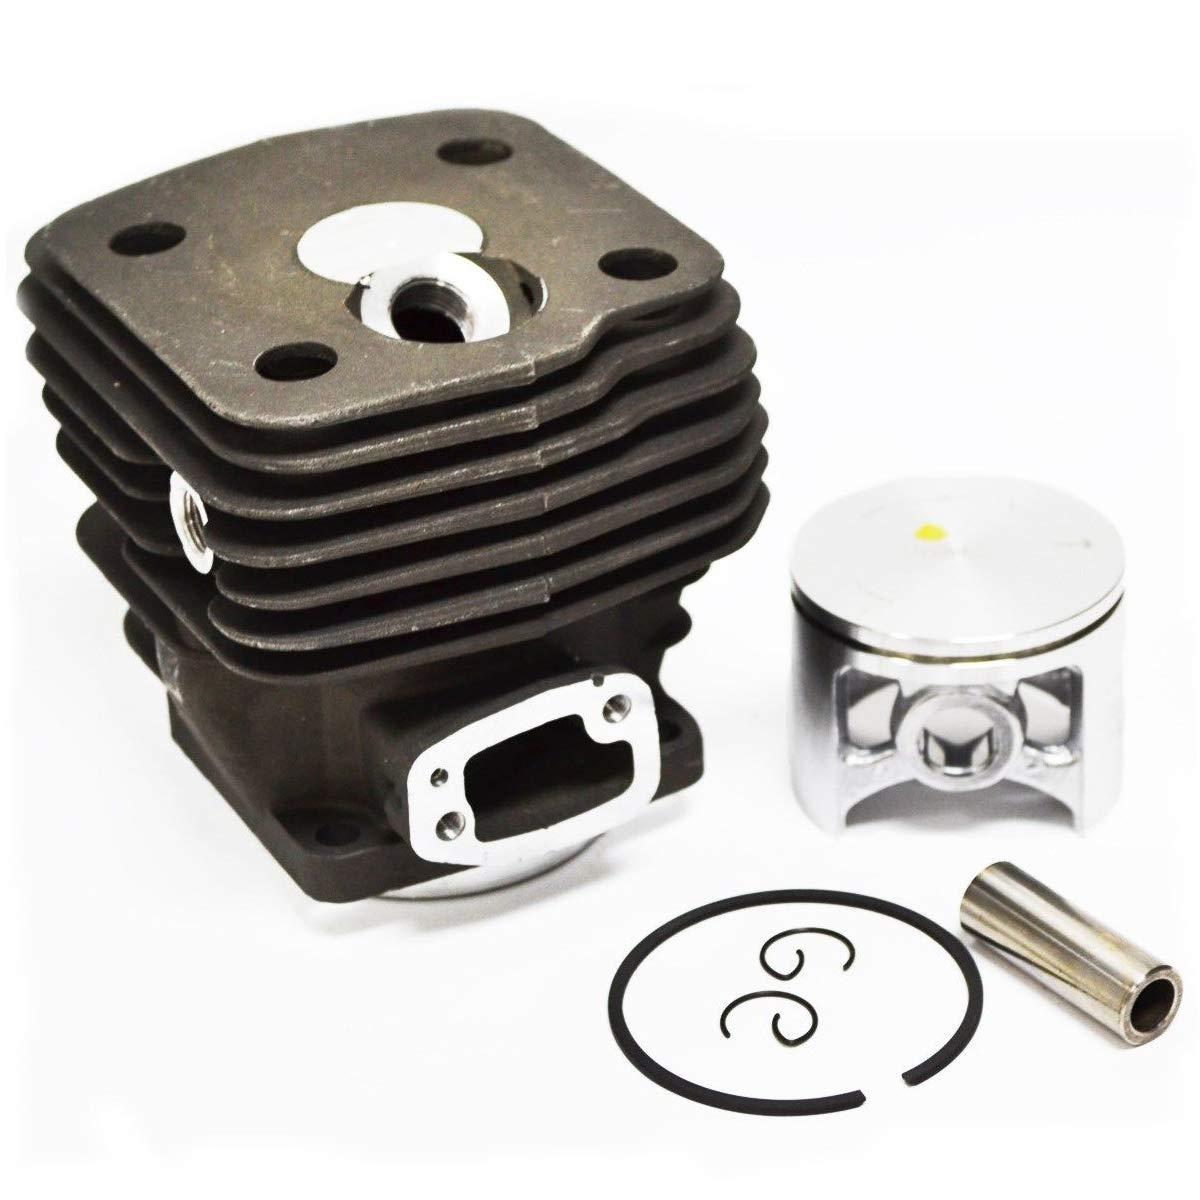 Nikasil Cylinder Piston Kit for Husqvarna 288 288XP 281 181 54mm 503 90 74 71